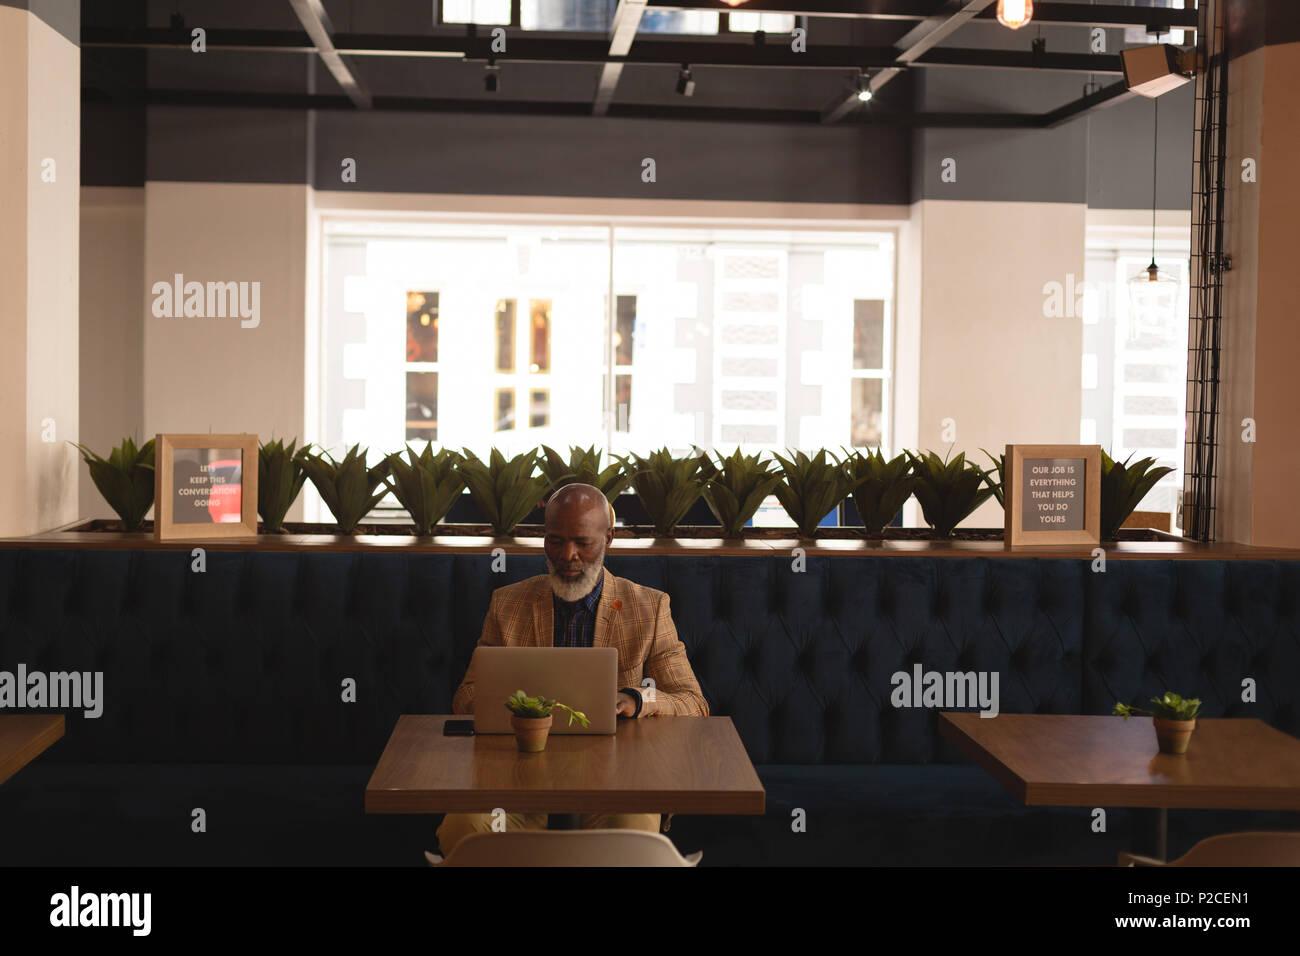 Senior Graphic Designer mit Laptop in der Cafeteria Stockfoto